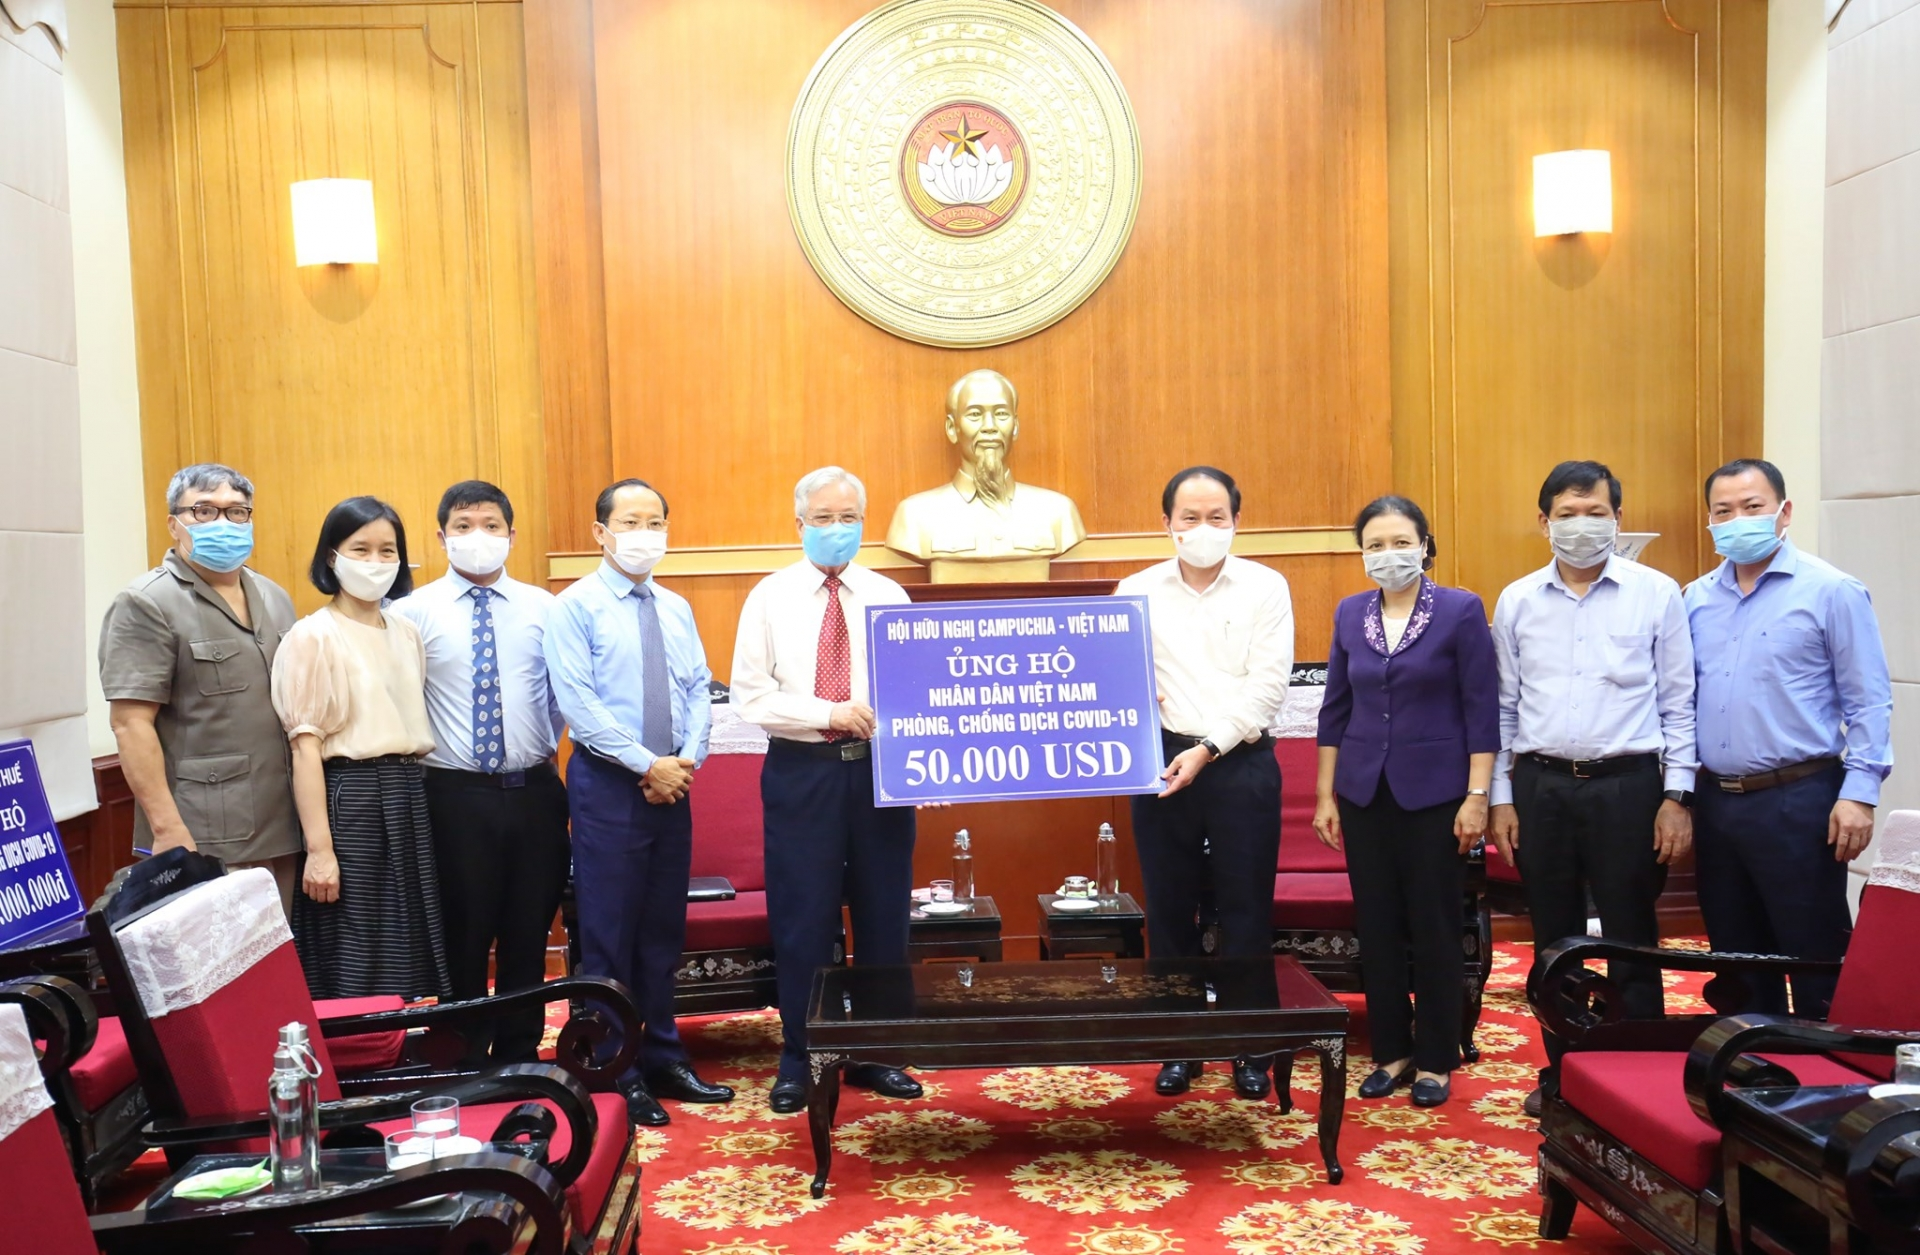 Vietnam Fatherland Front Receives $50,000 USD from Cambodia - Vietnam Friendship Association